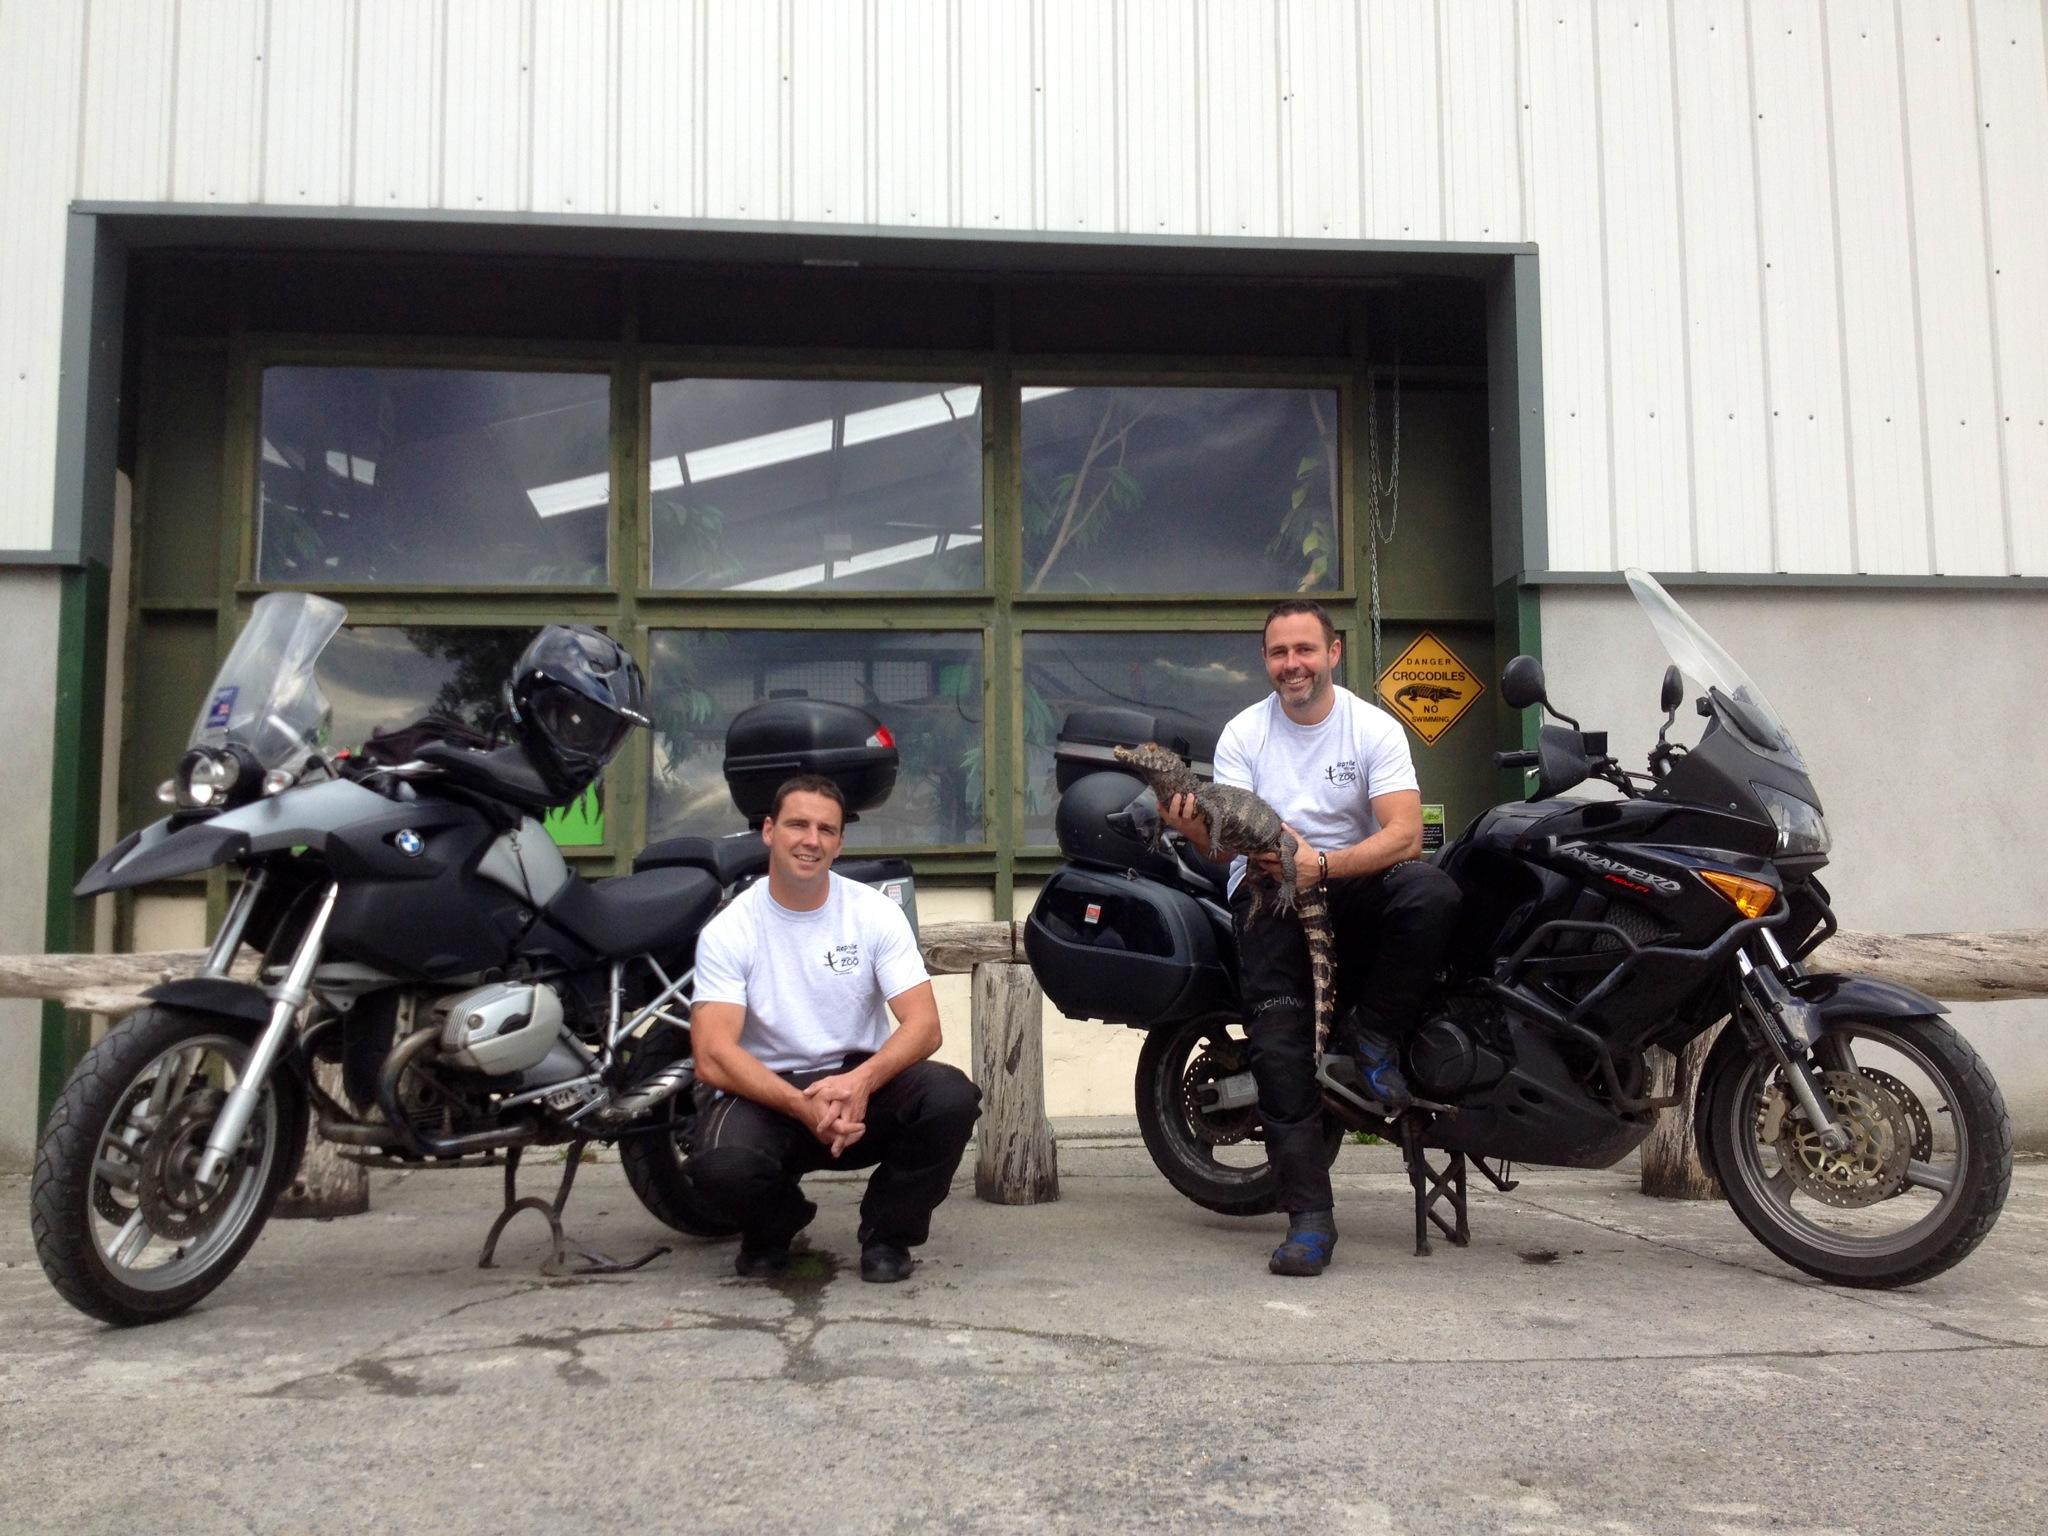 James, Paul, Caiman, Bikes